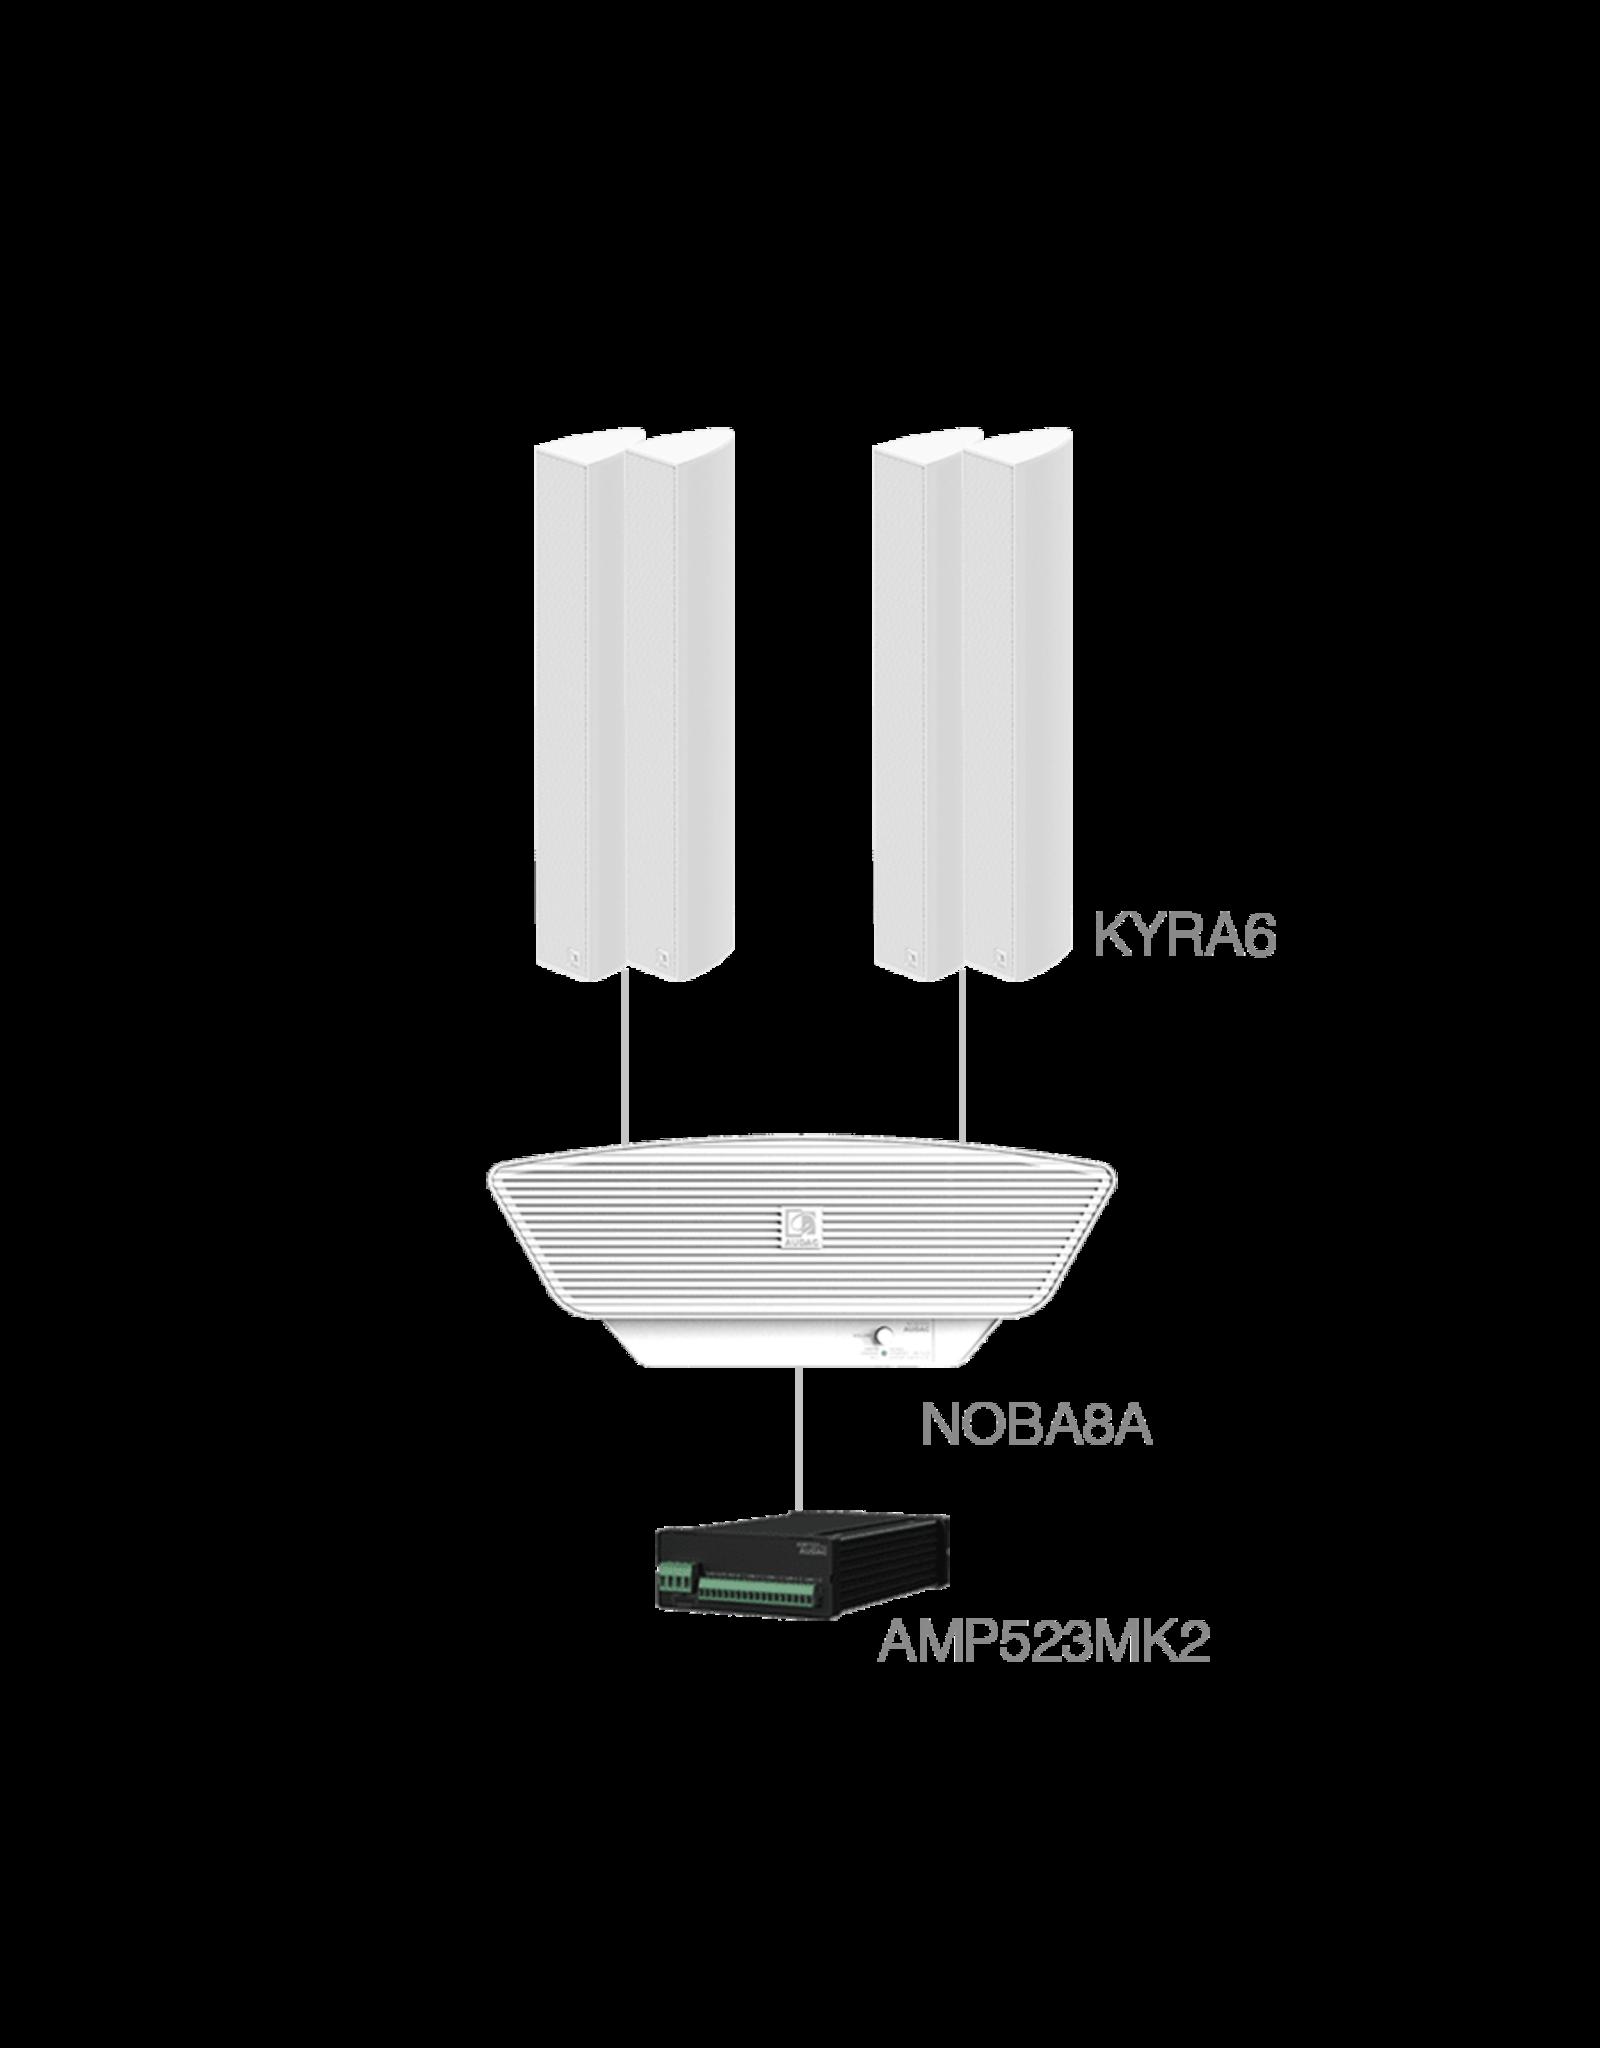 Audac 4 x KYRA6 + NOBA8A  + AMP523MK2 White